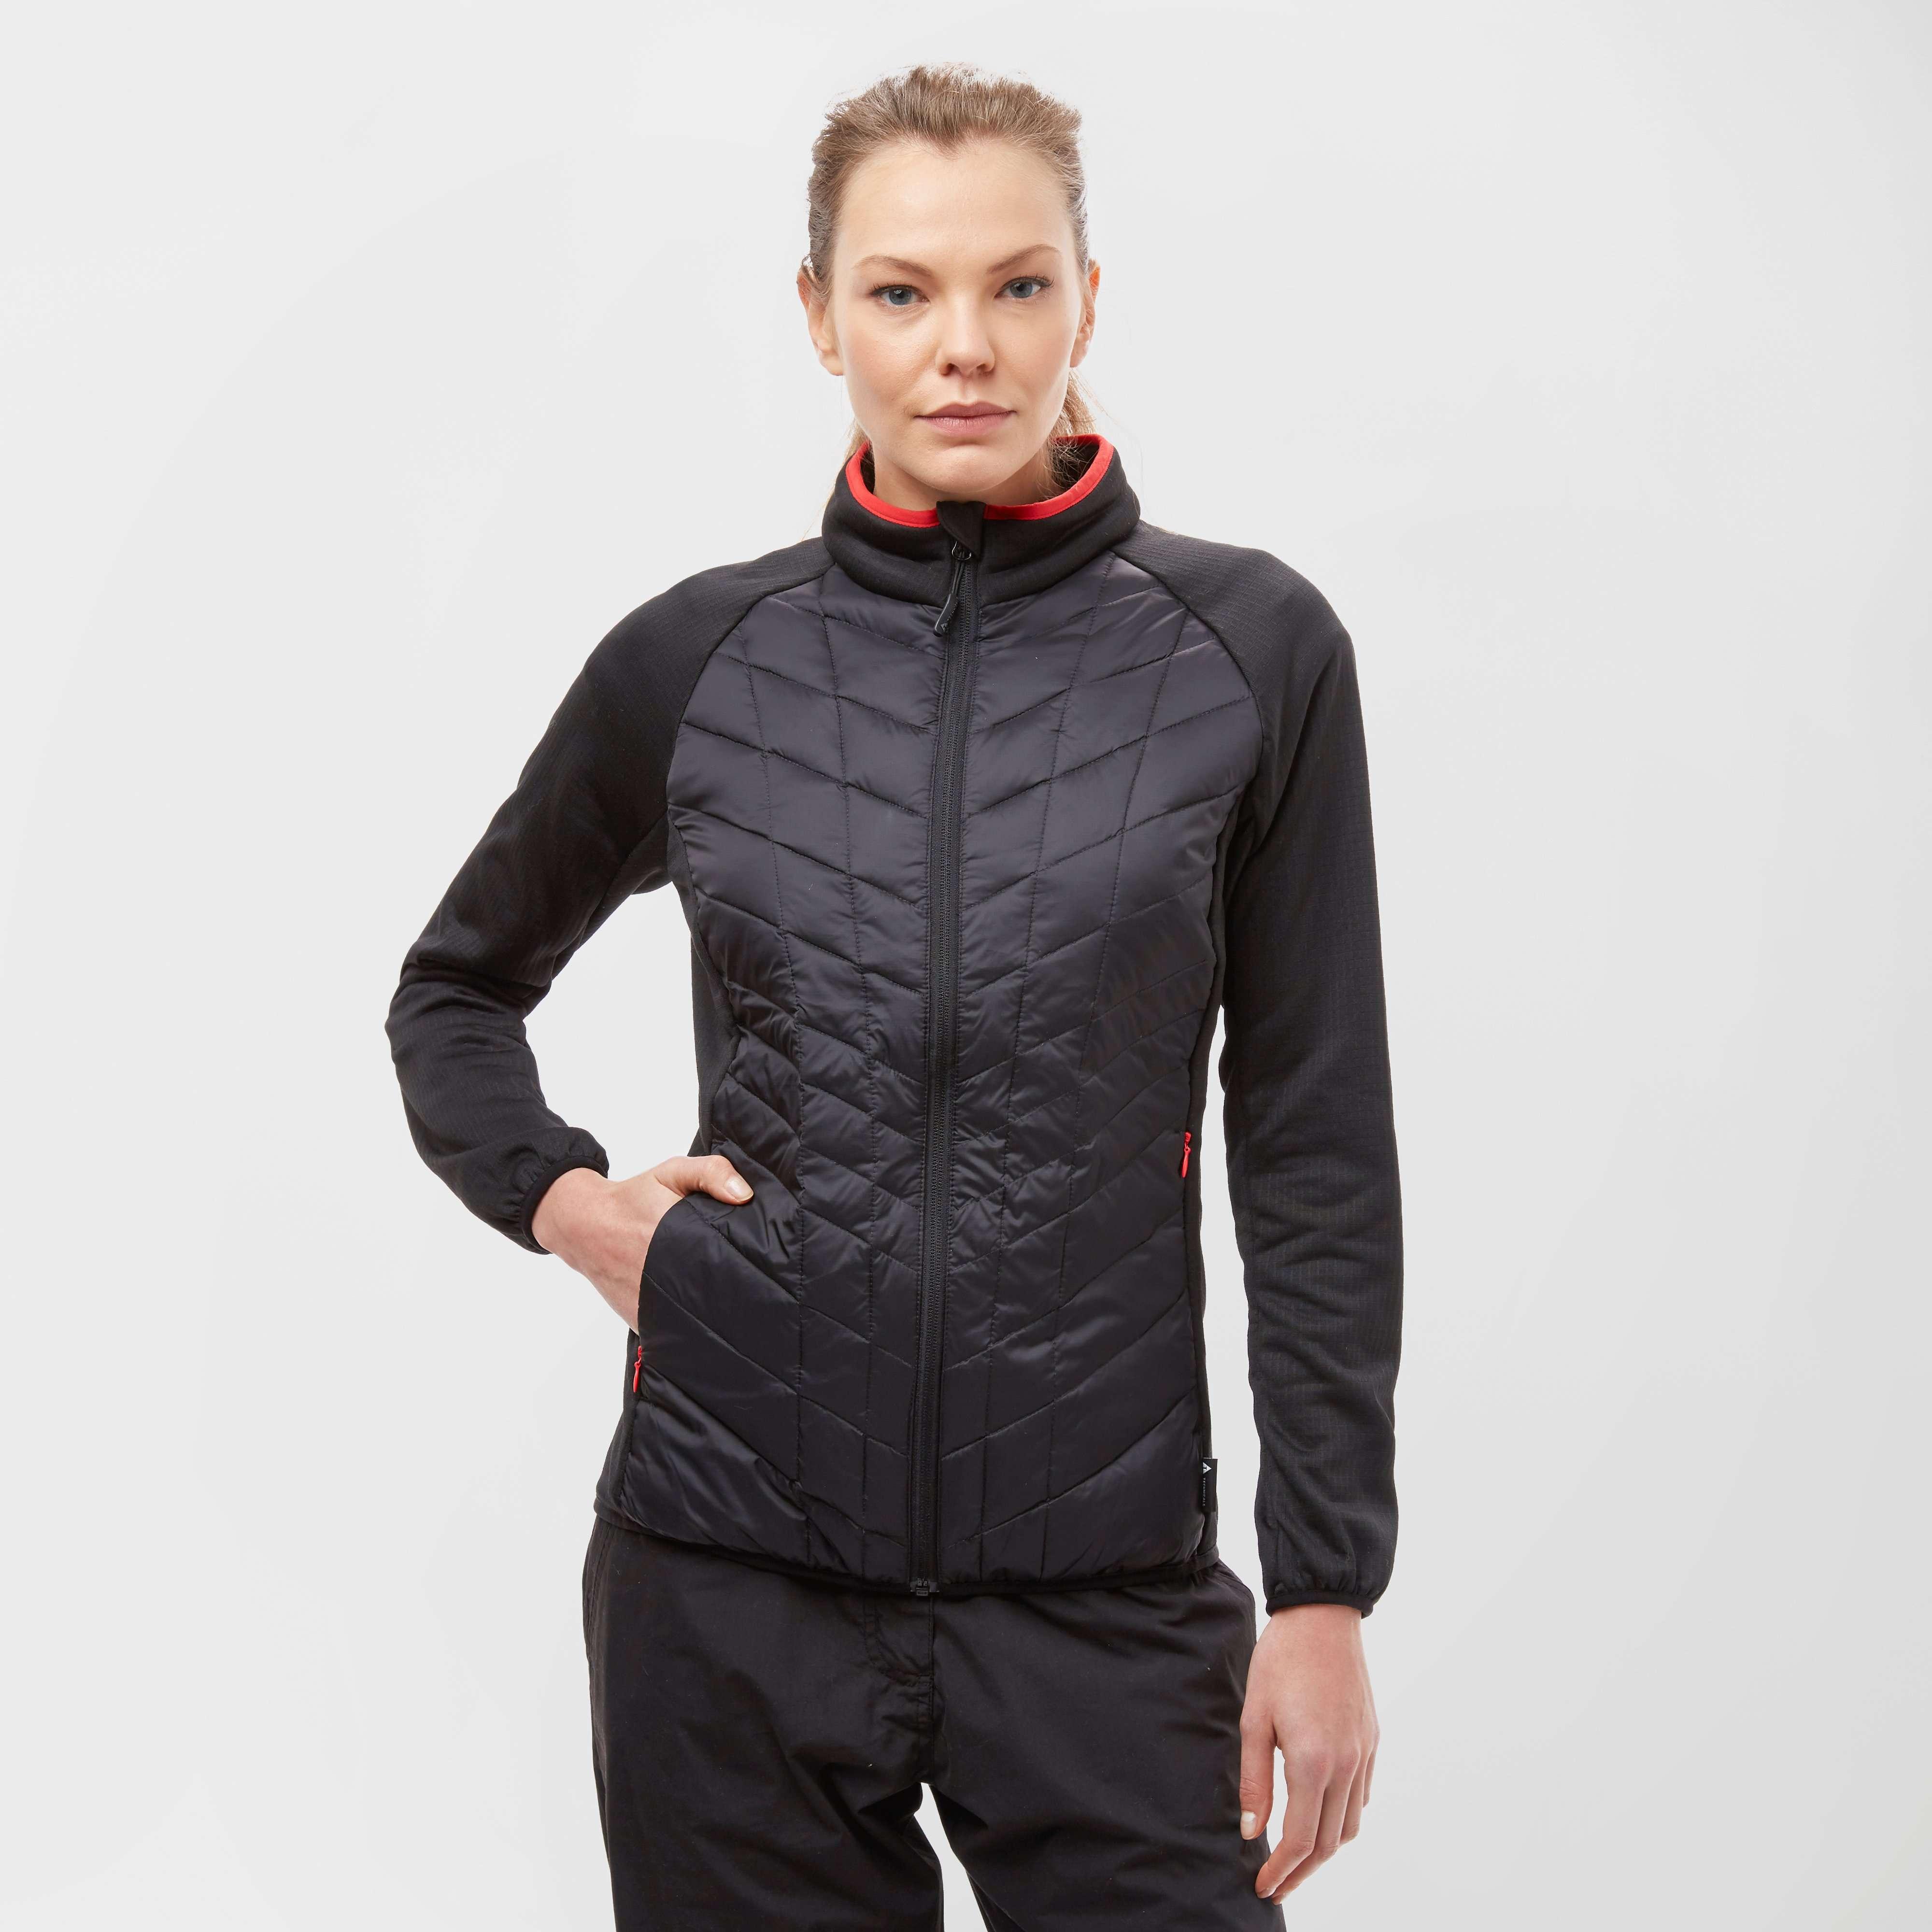 TECHNICALS Women's Spring Hybrid Jacket